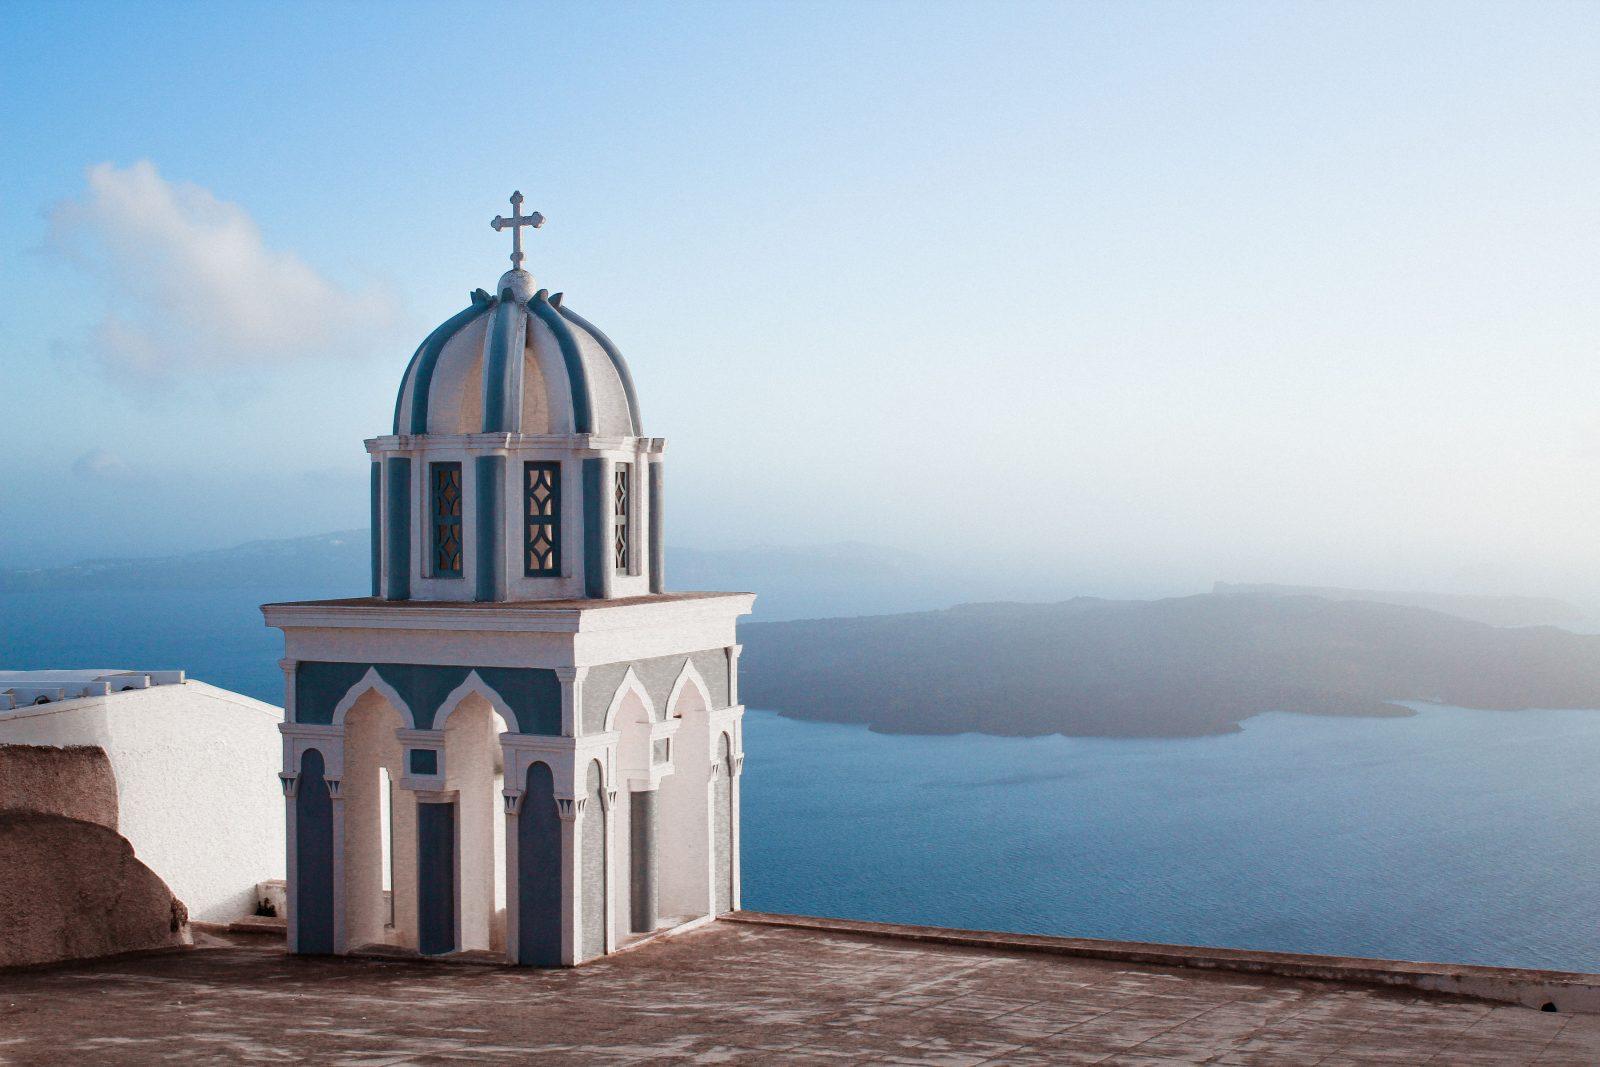 Santorini chapel in Greece